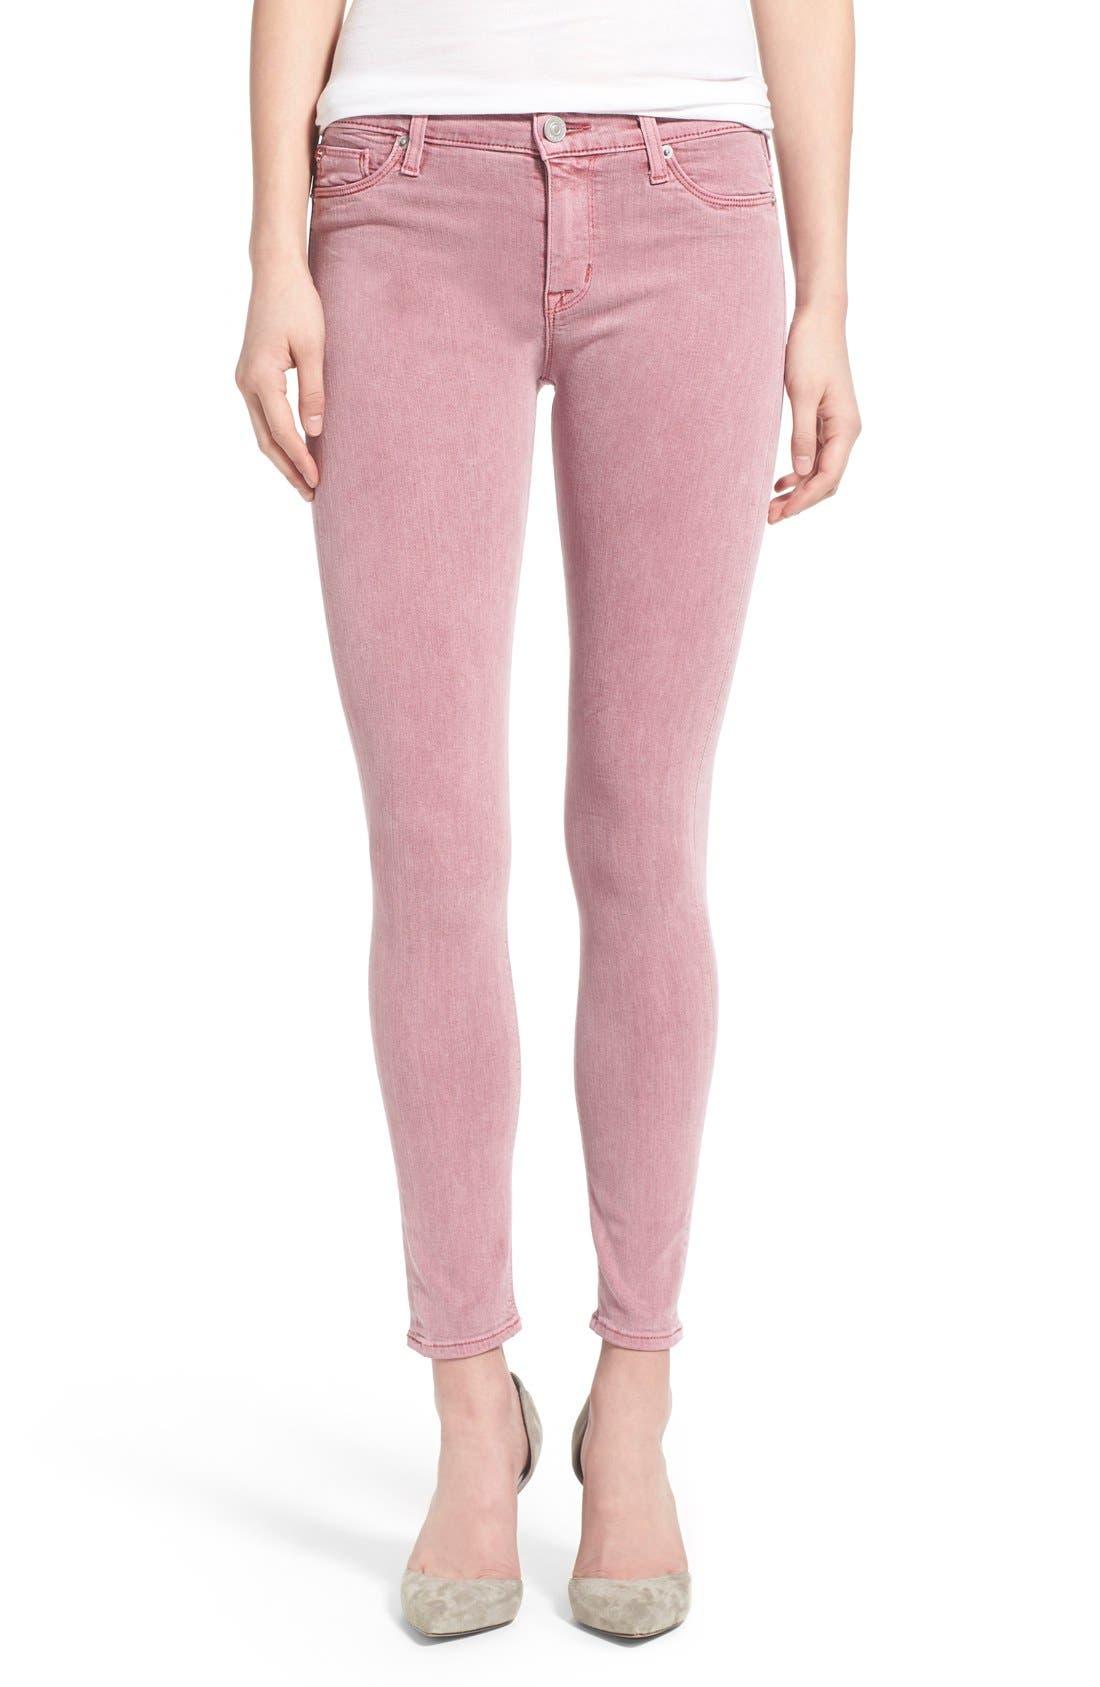 Main Image - Hudson Jeans 'Nico' Ankle Skinny Jeans